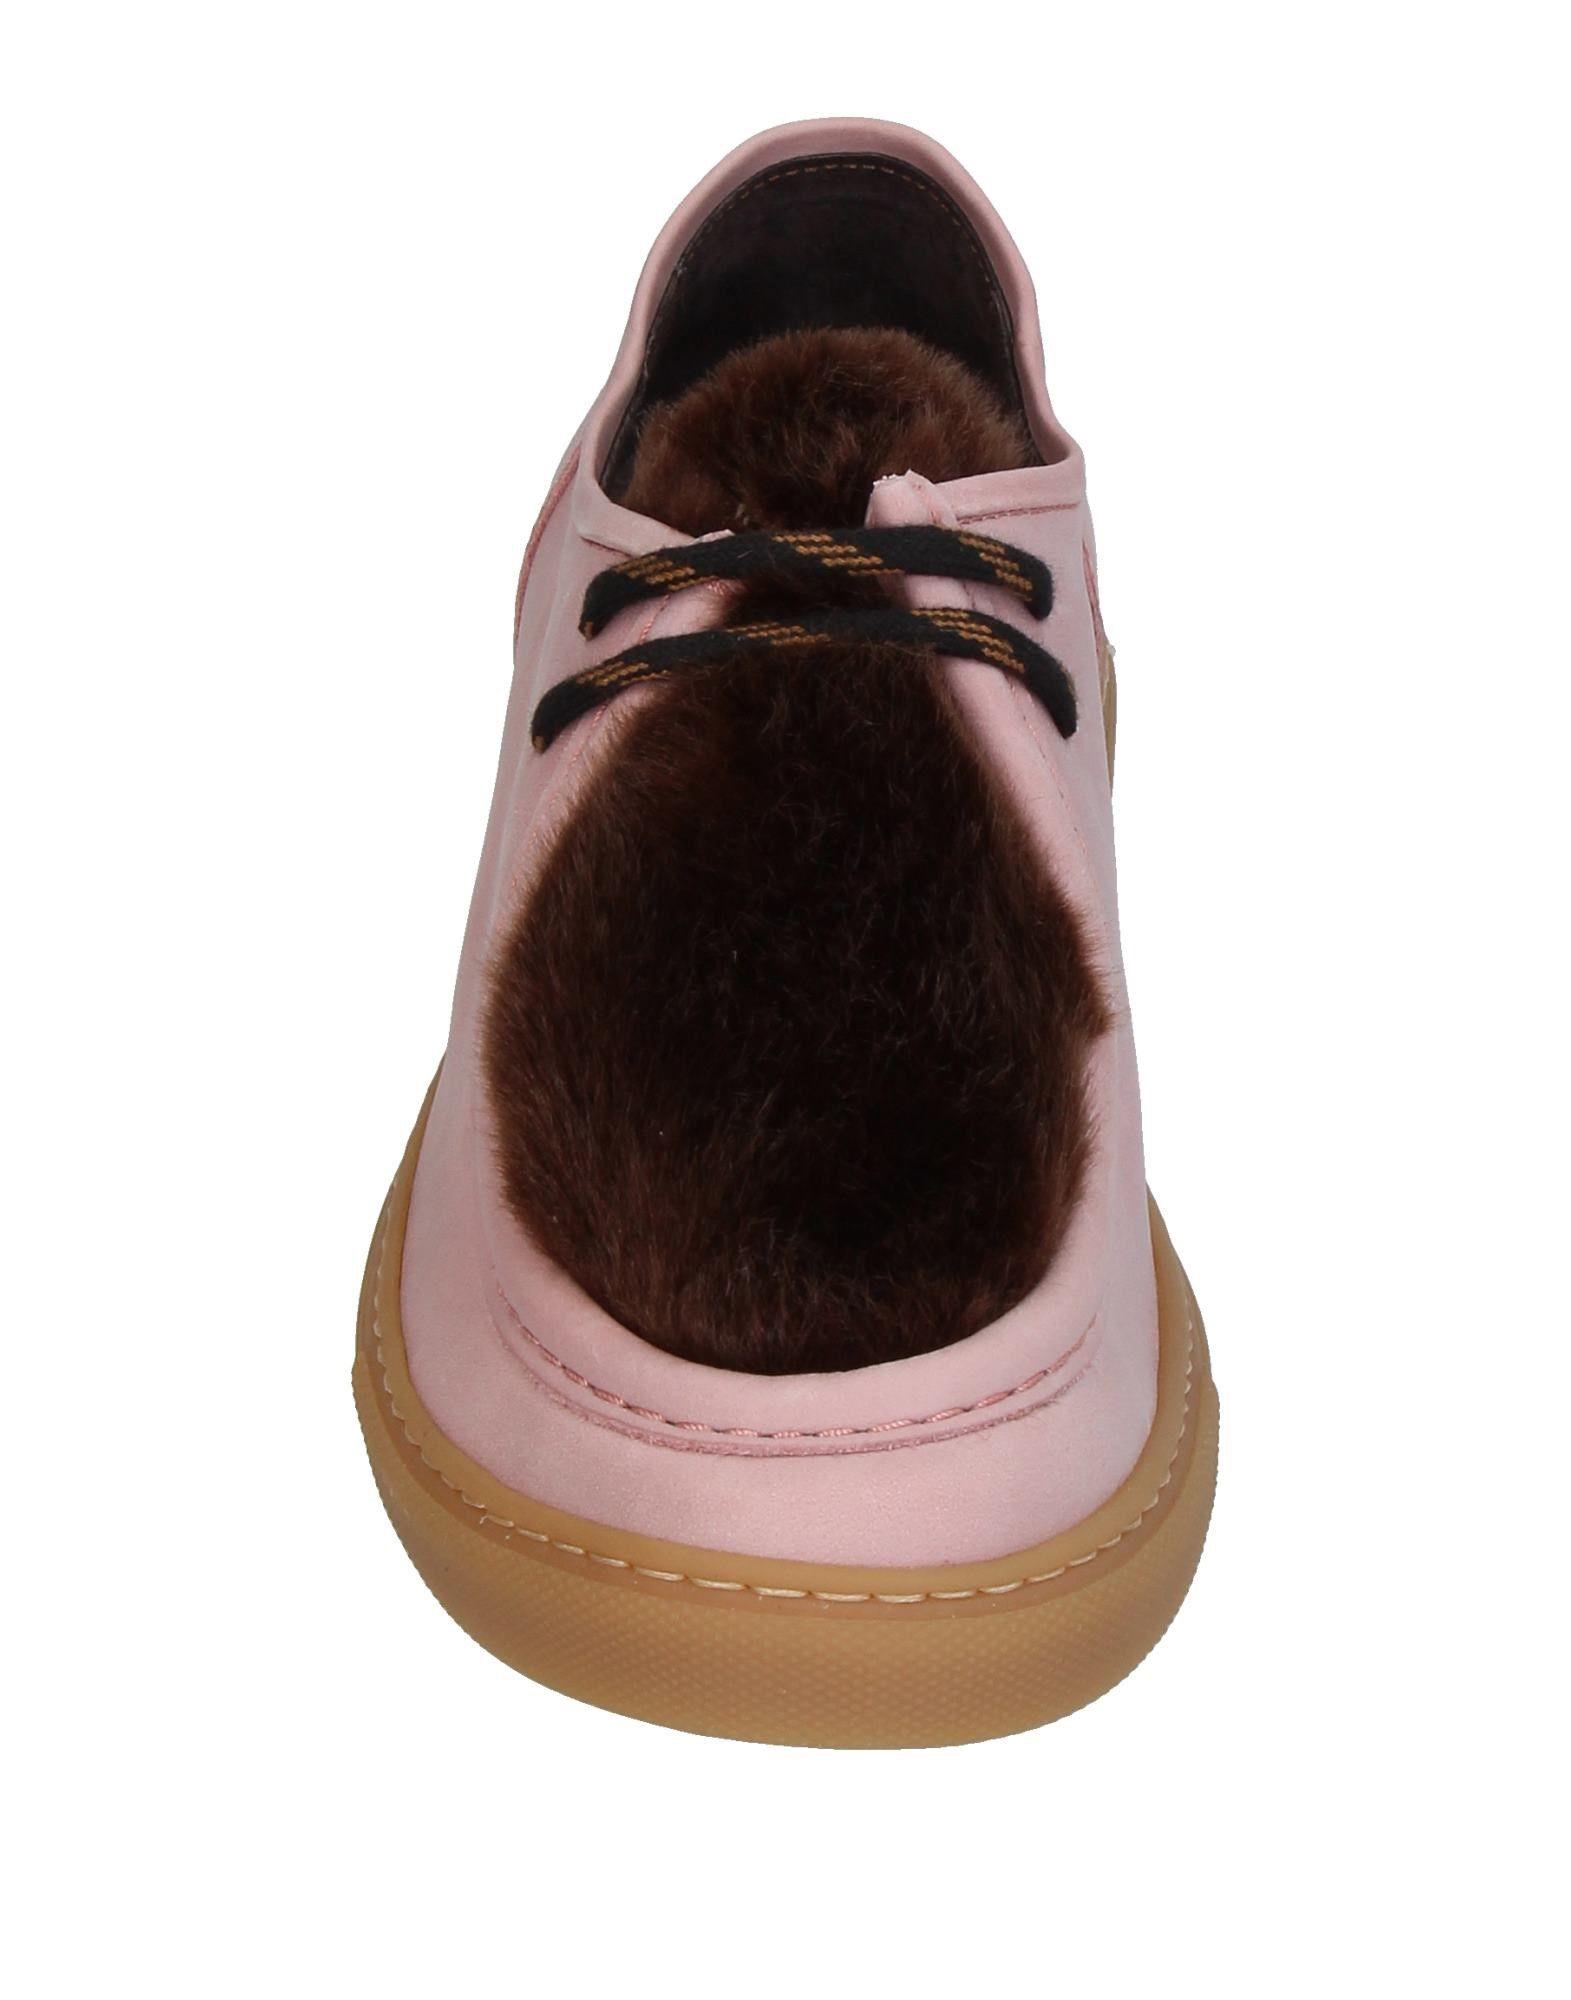 CHAUSSURES - Chaussures à lacetsPunto Pigro einBxCCtkV